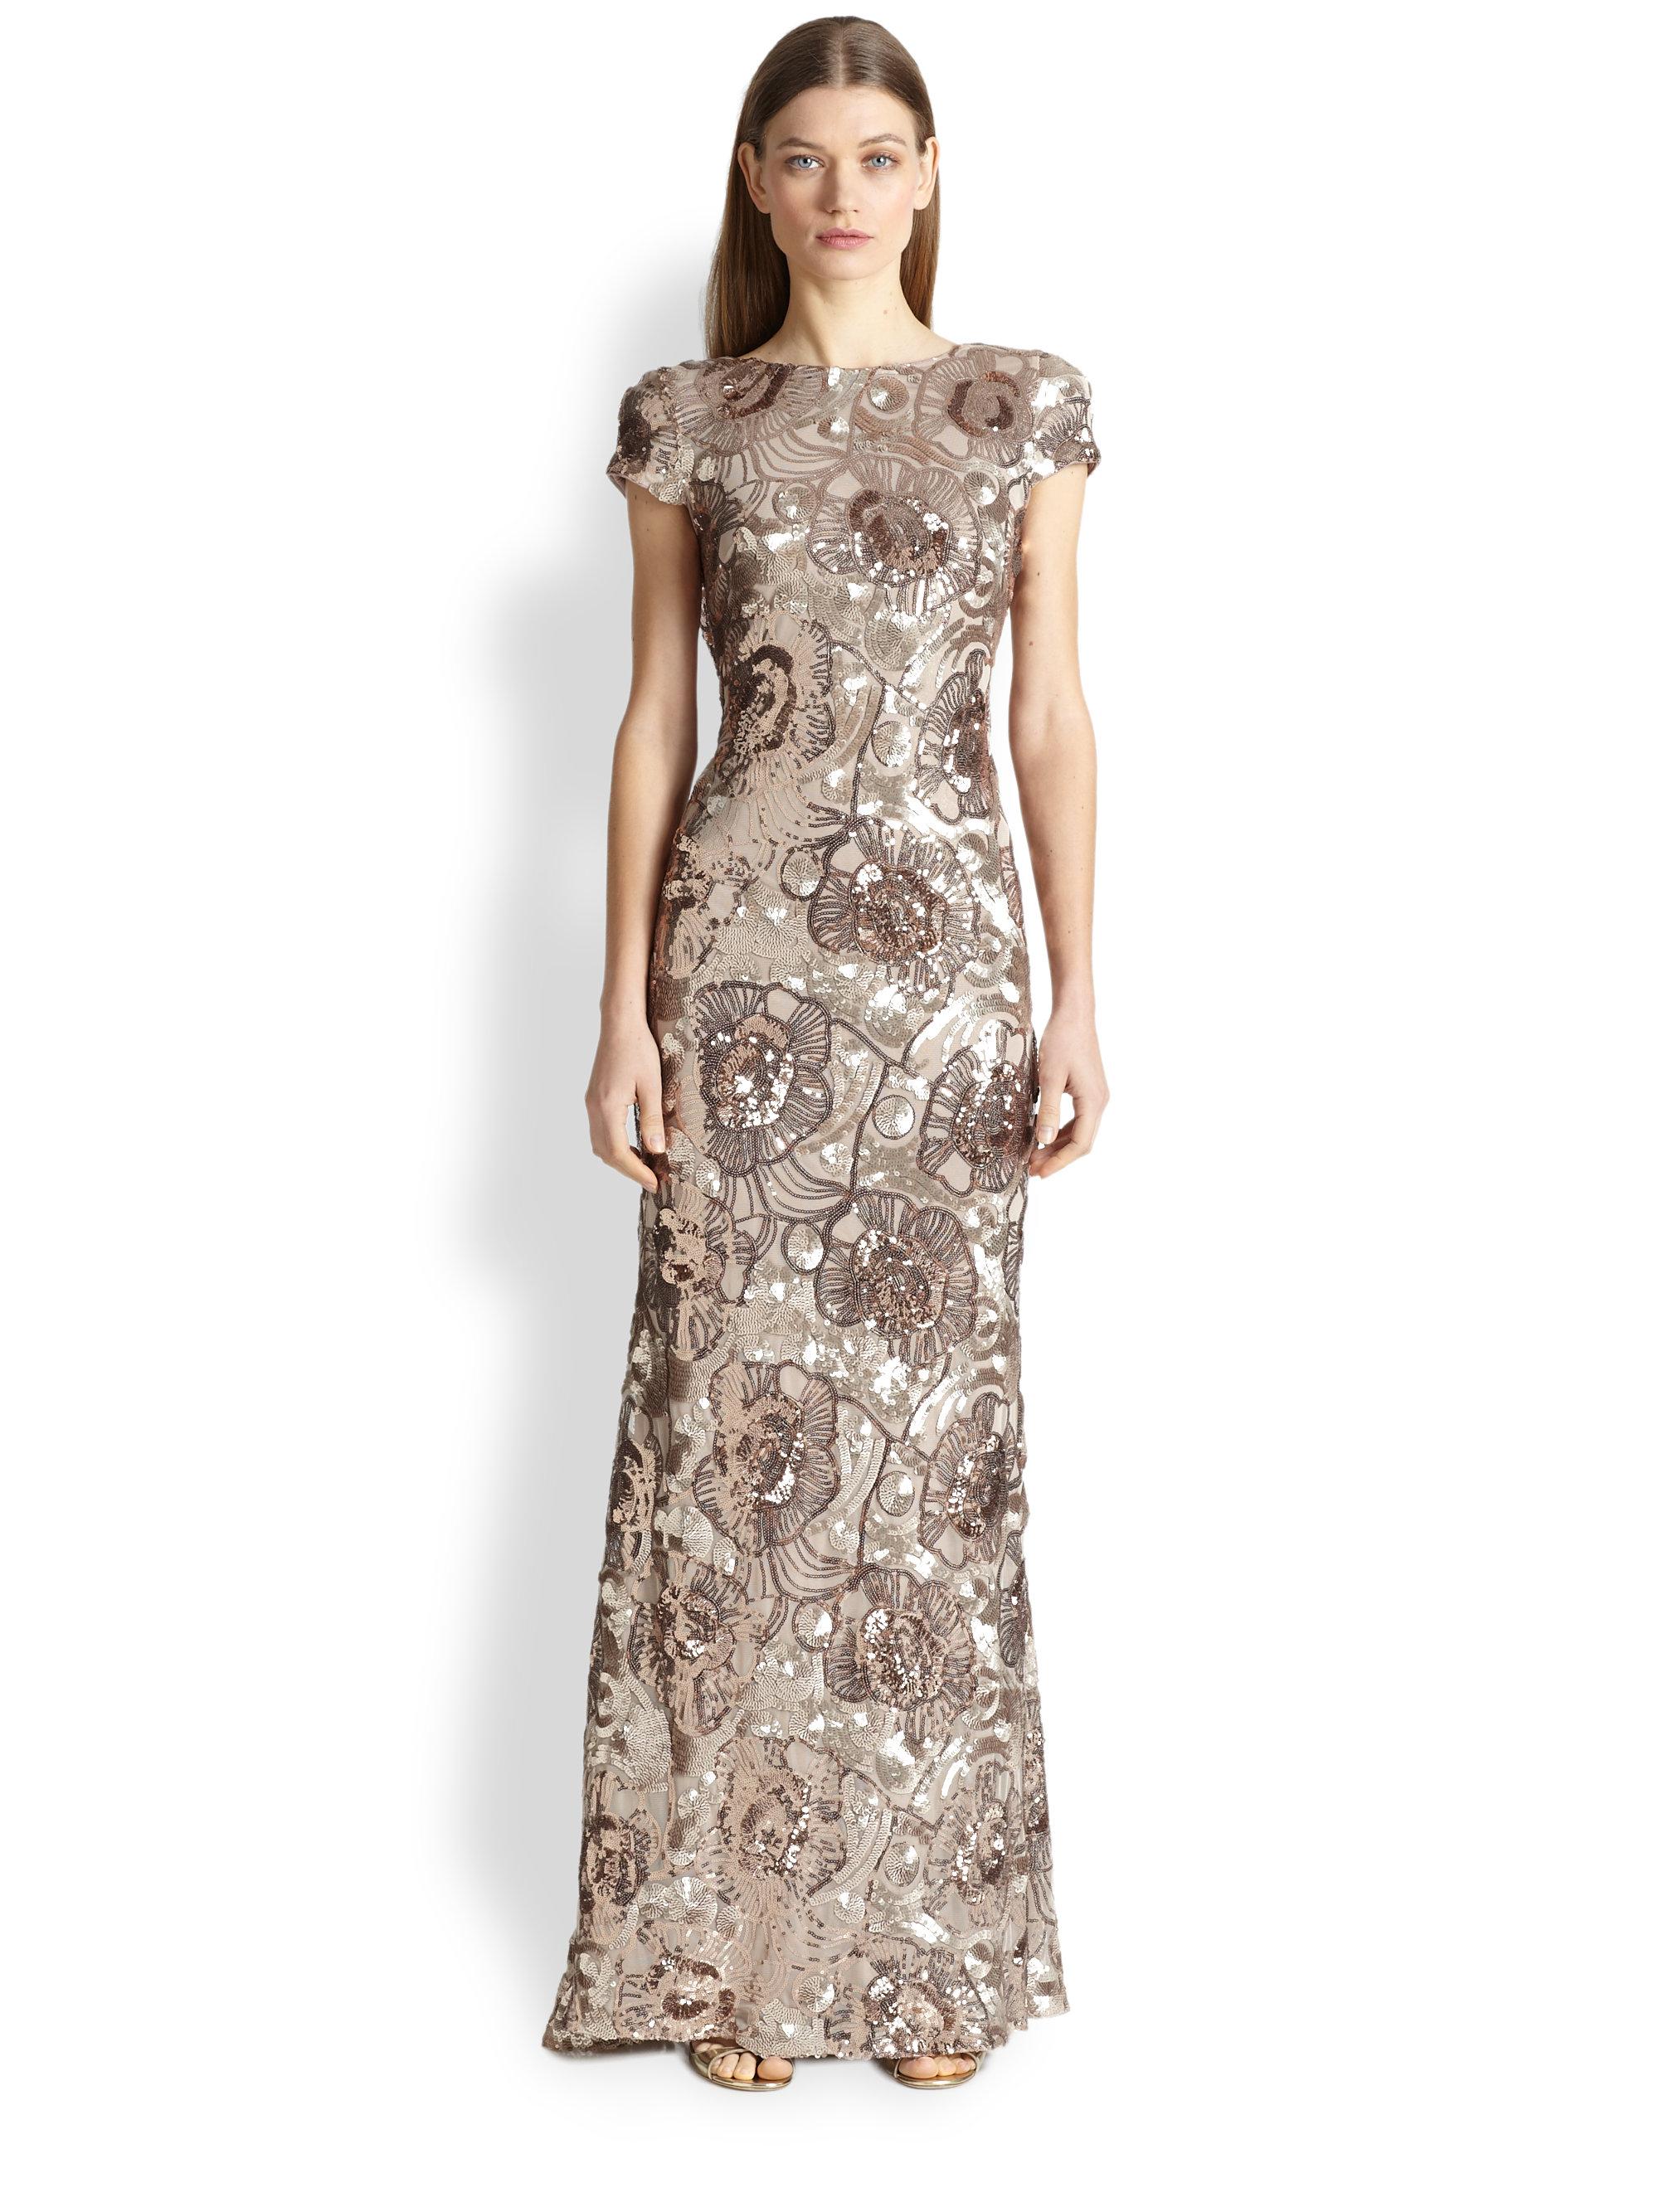 Lyst - Badgley Mischka Floral Sequin Gown